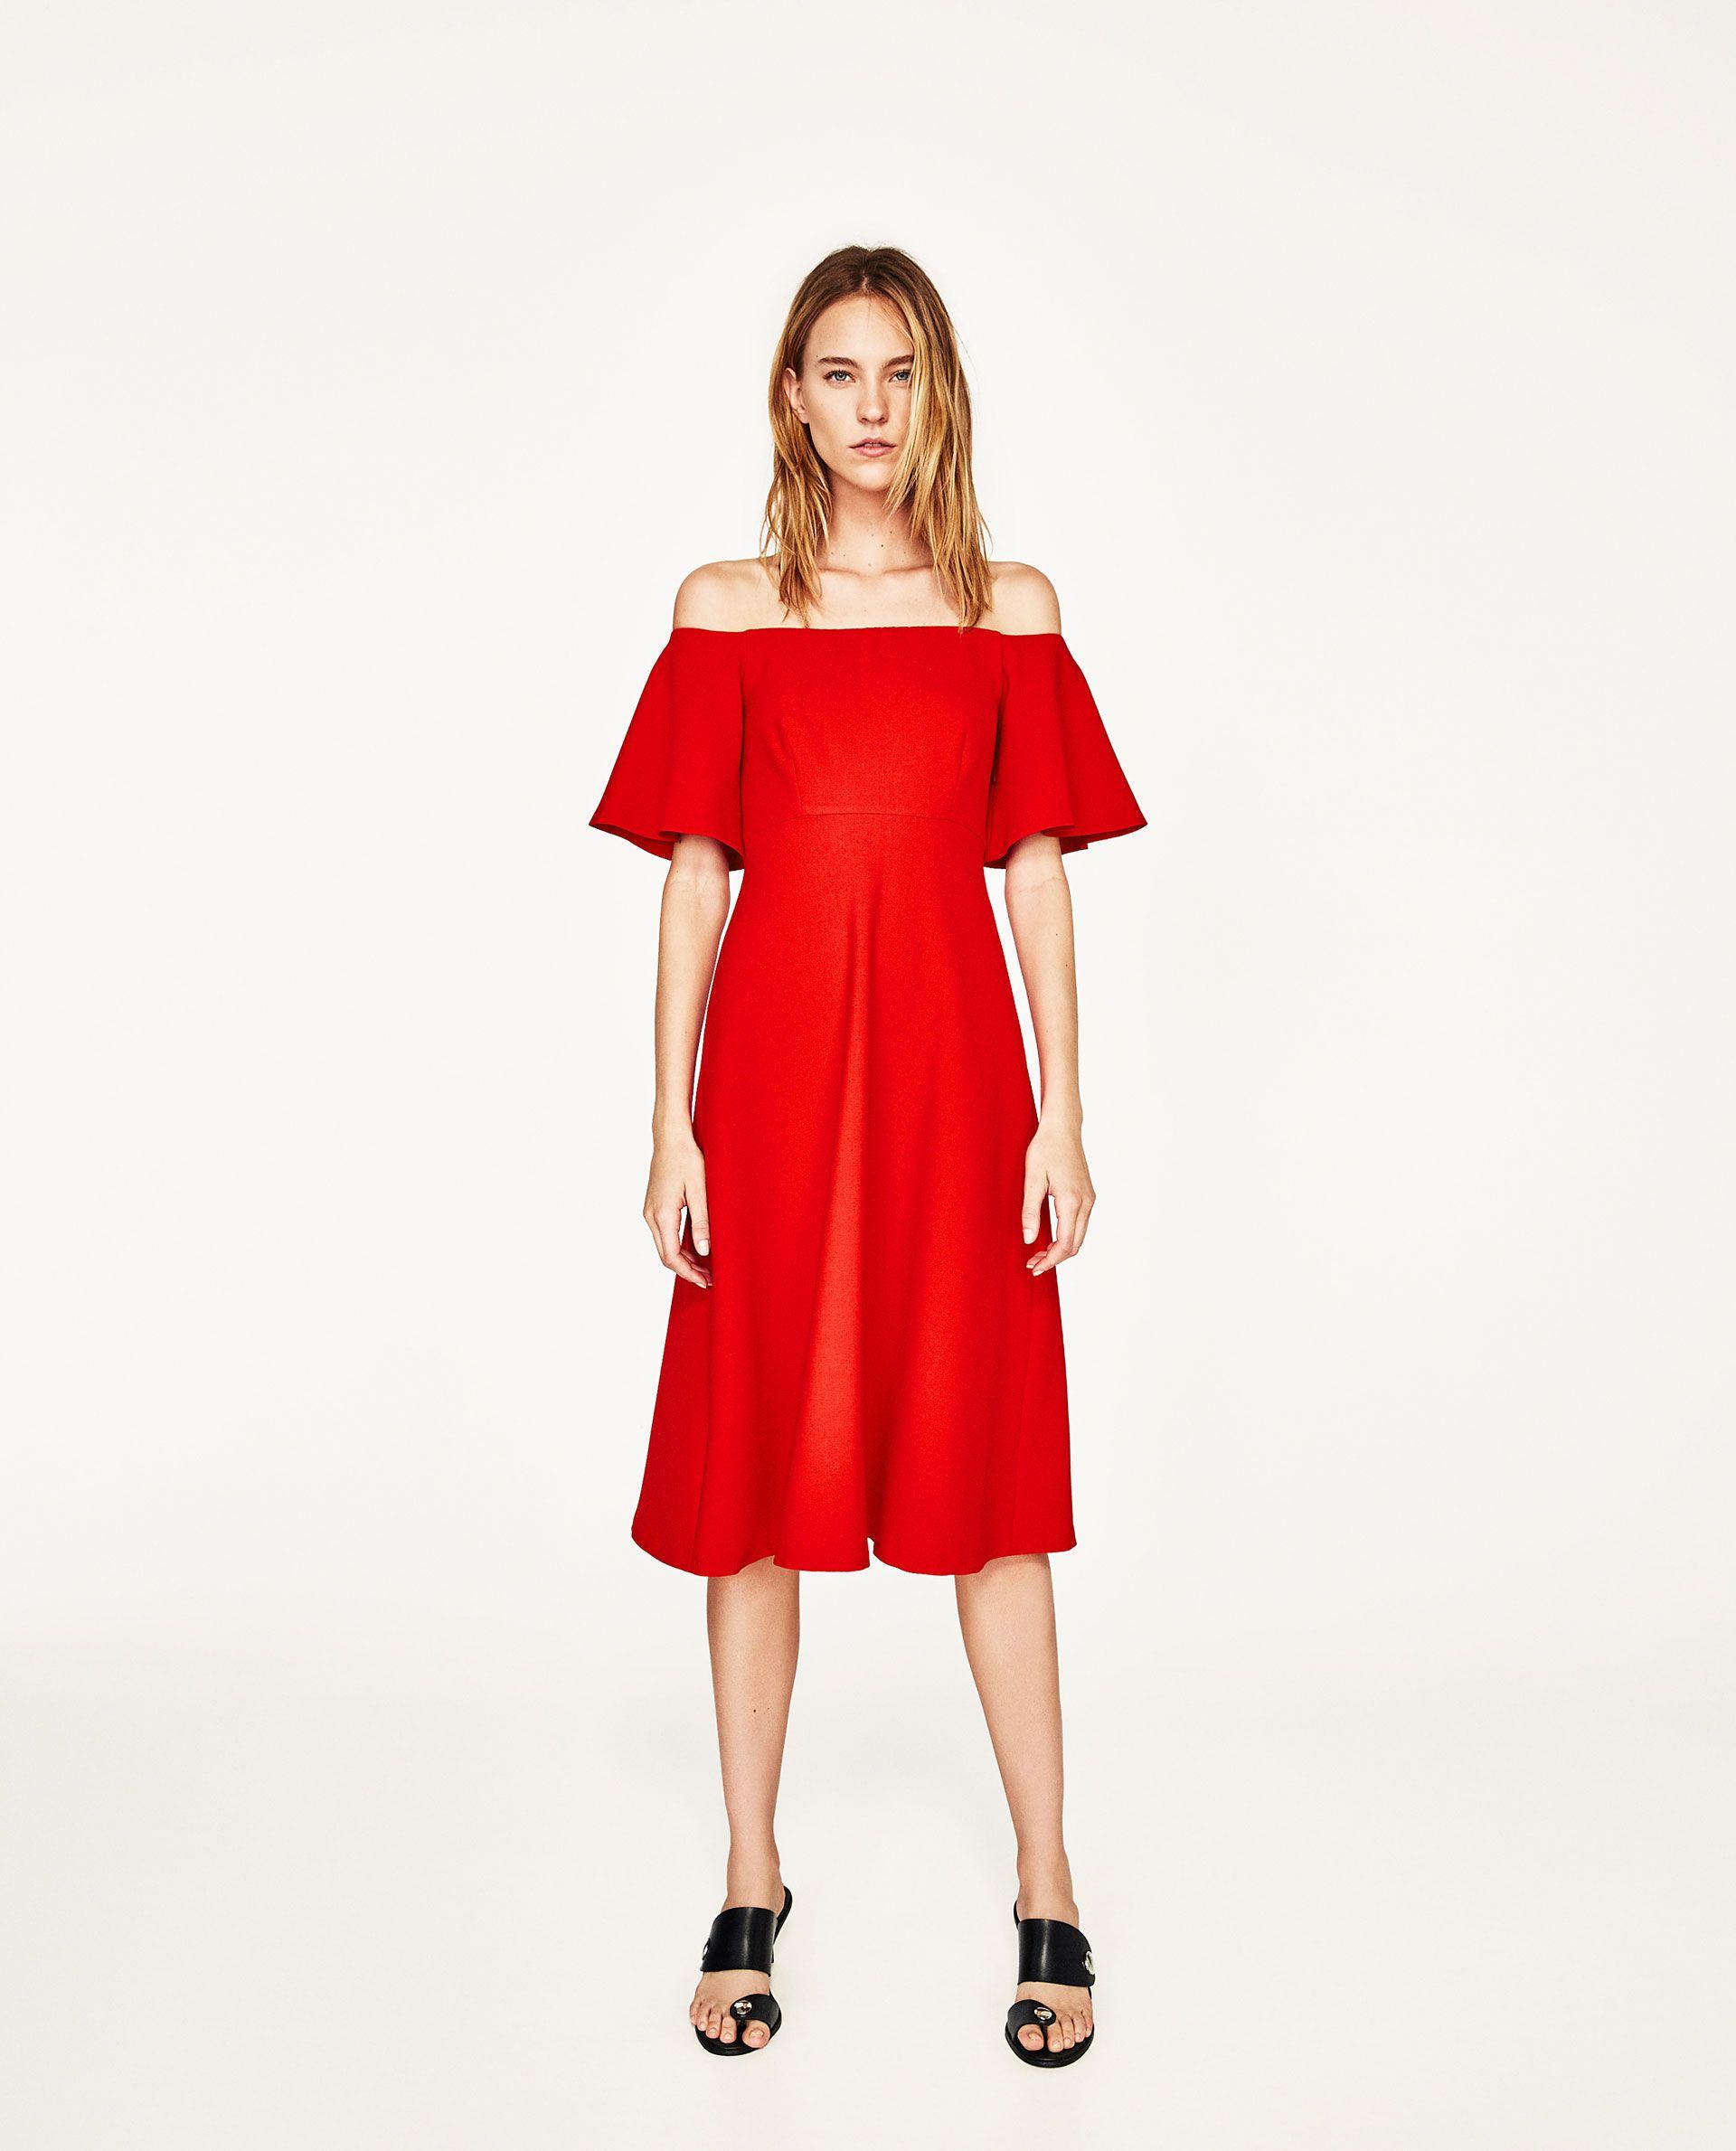 ZARA - WOMAN - OFF-THE-SHOULDER DRESS  Event kleider